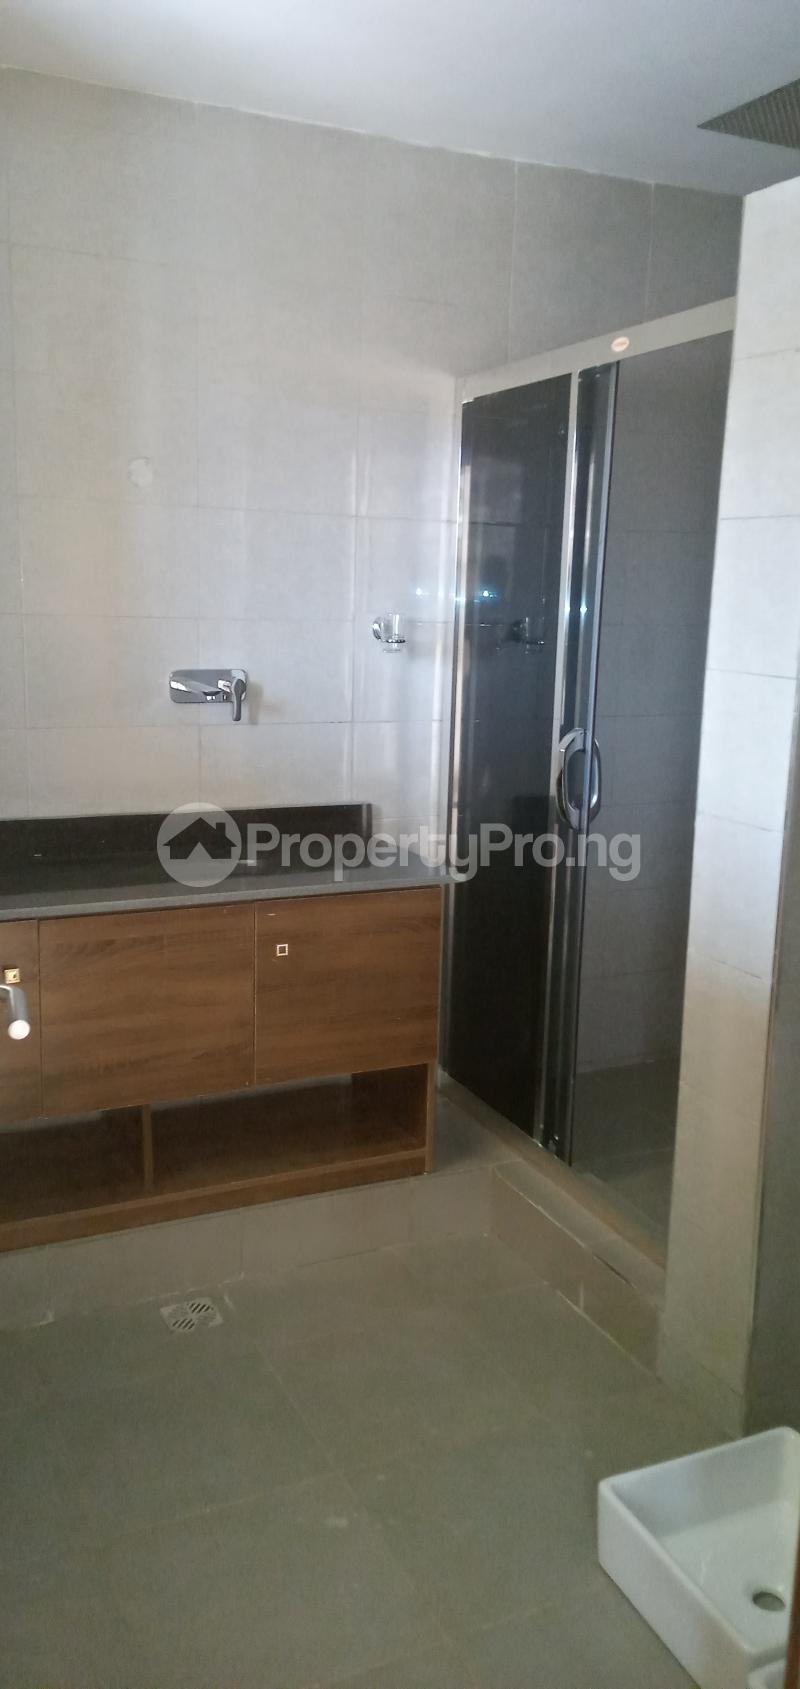 4 bedroom Terraced Duplex House for sale Close To Nnpc Guzape Guzape Abuja - 0